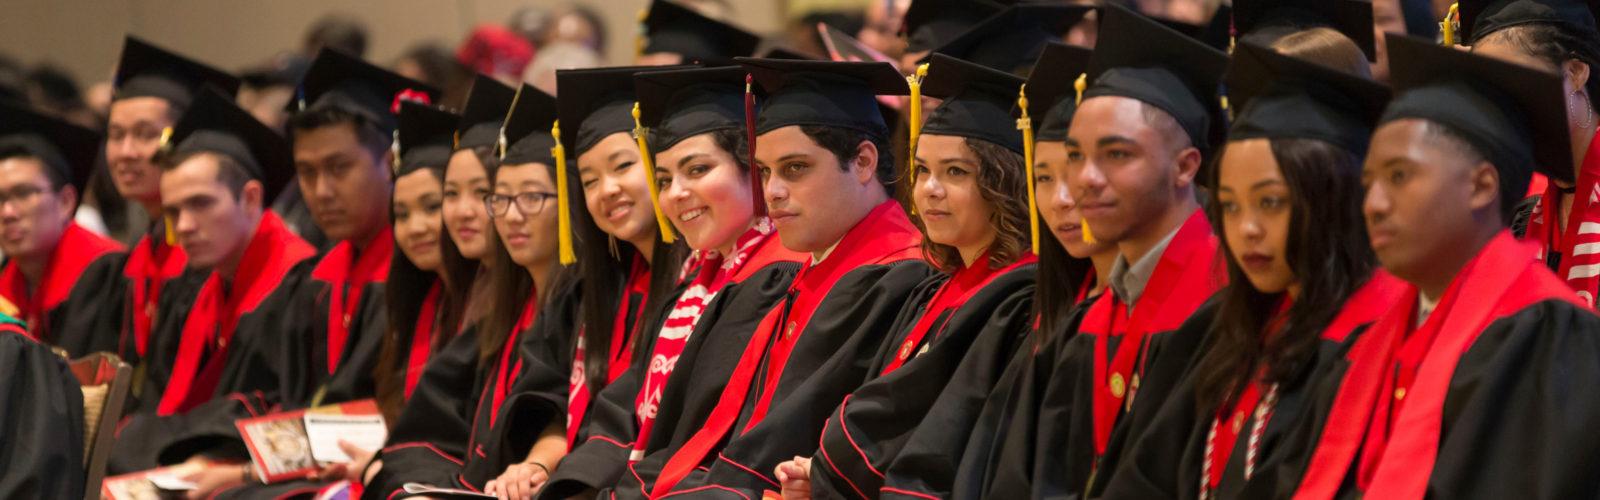 DDEEA Graduation Union South May 12, 2017. (Photo © Andy Manis)